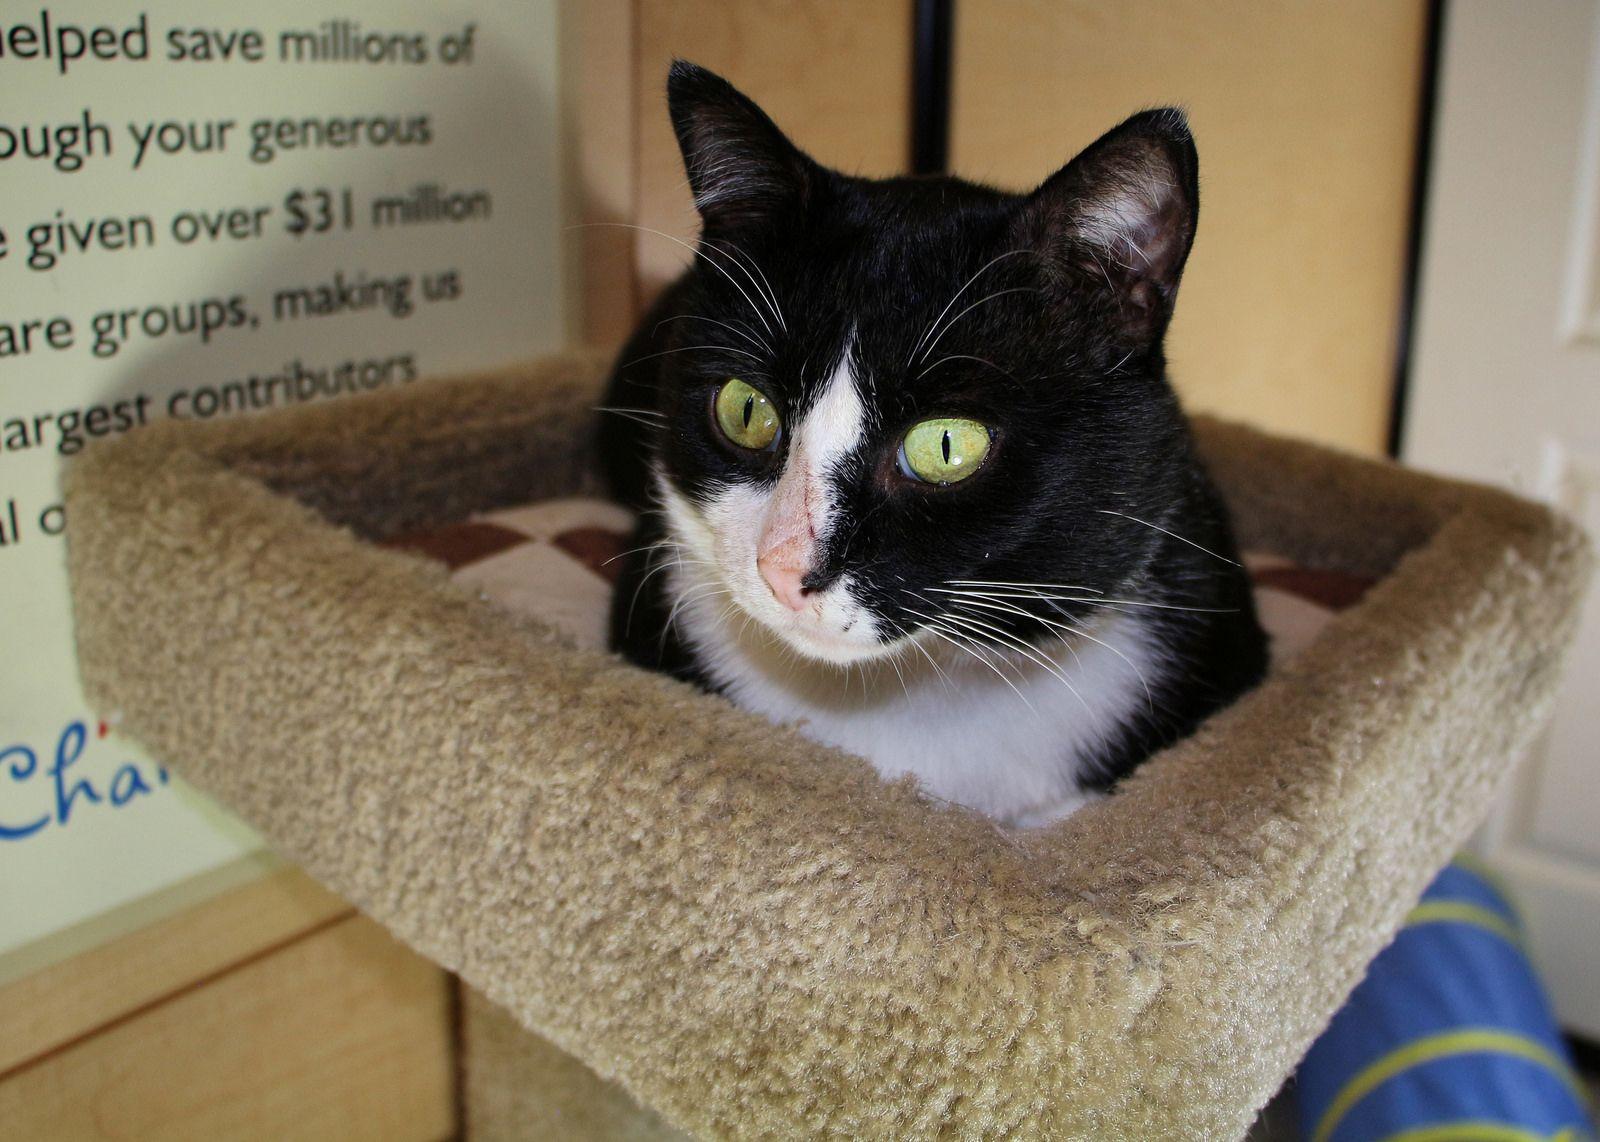 Dartmouth Scat Petsmart Adoption Centre July 4 2016 Cat Adoption Adoption Center Adoption